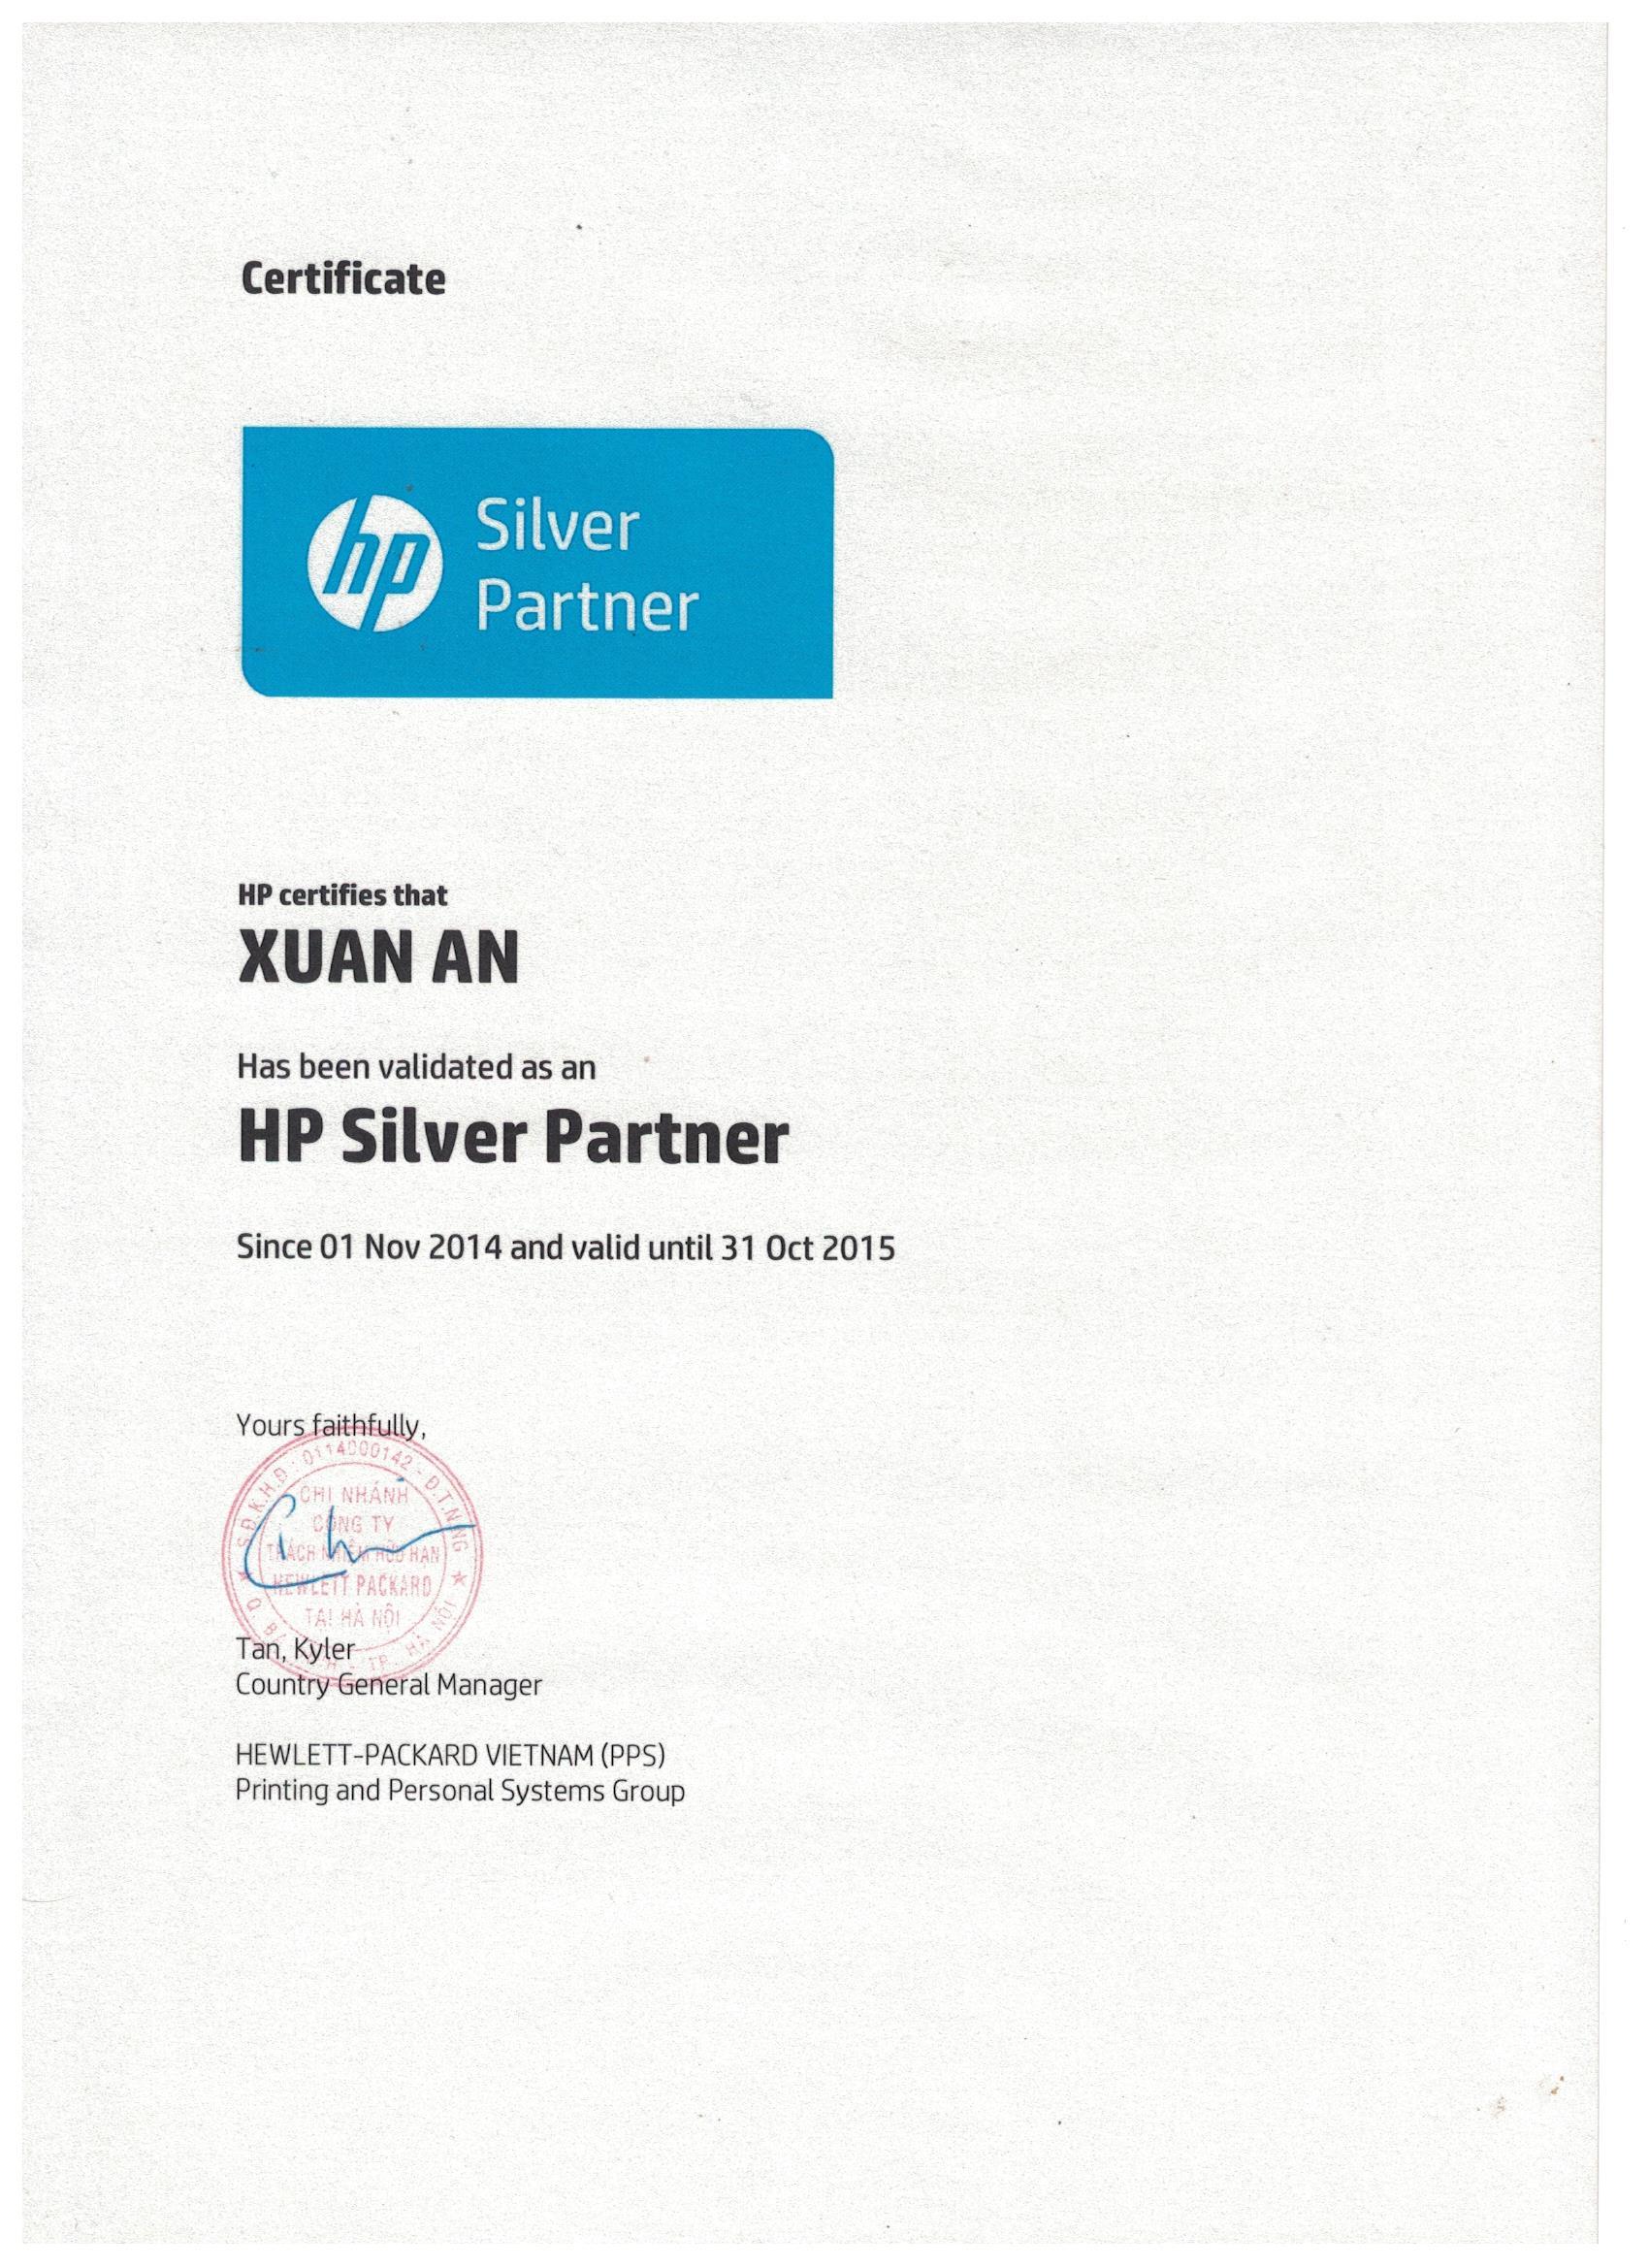 HP Probook 450 G7 - 9GQ37PA (Silver)